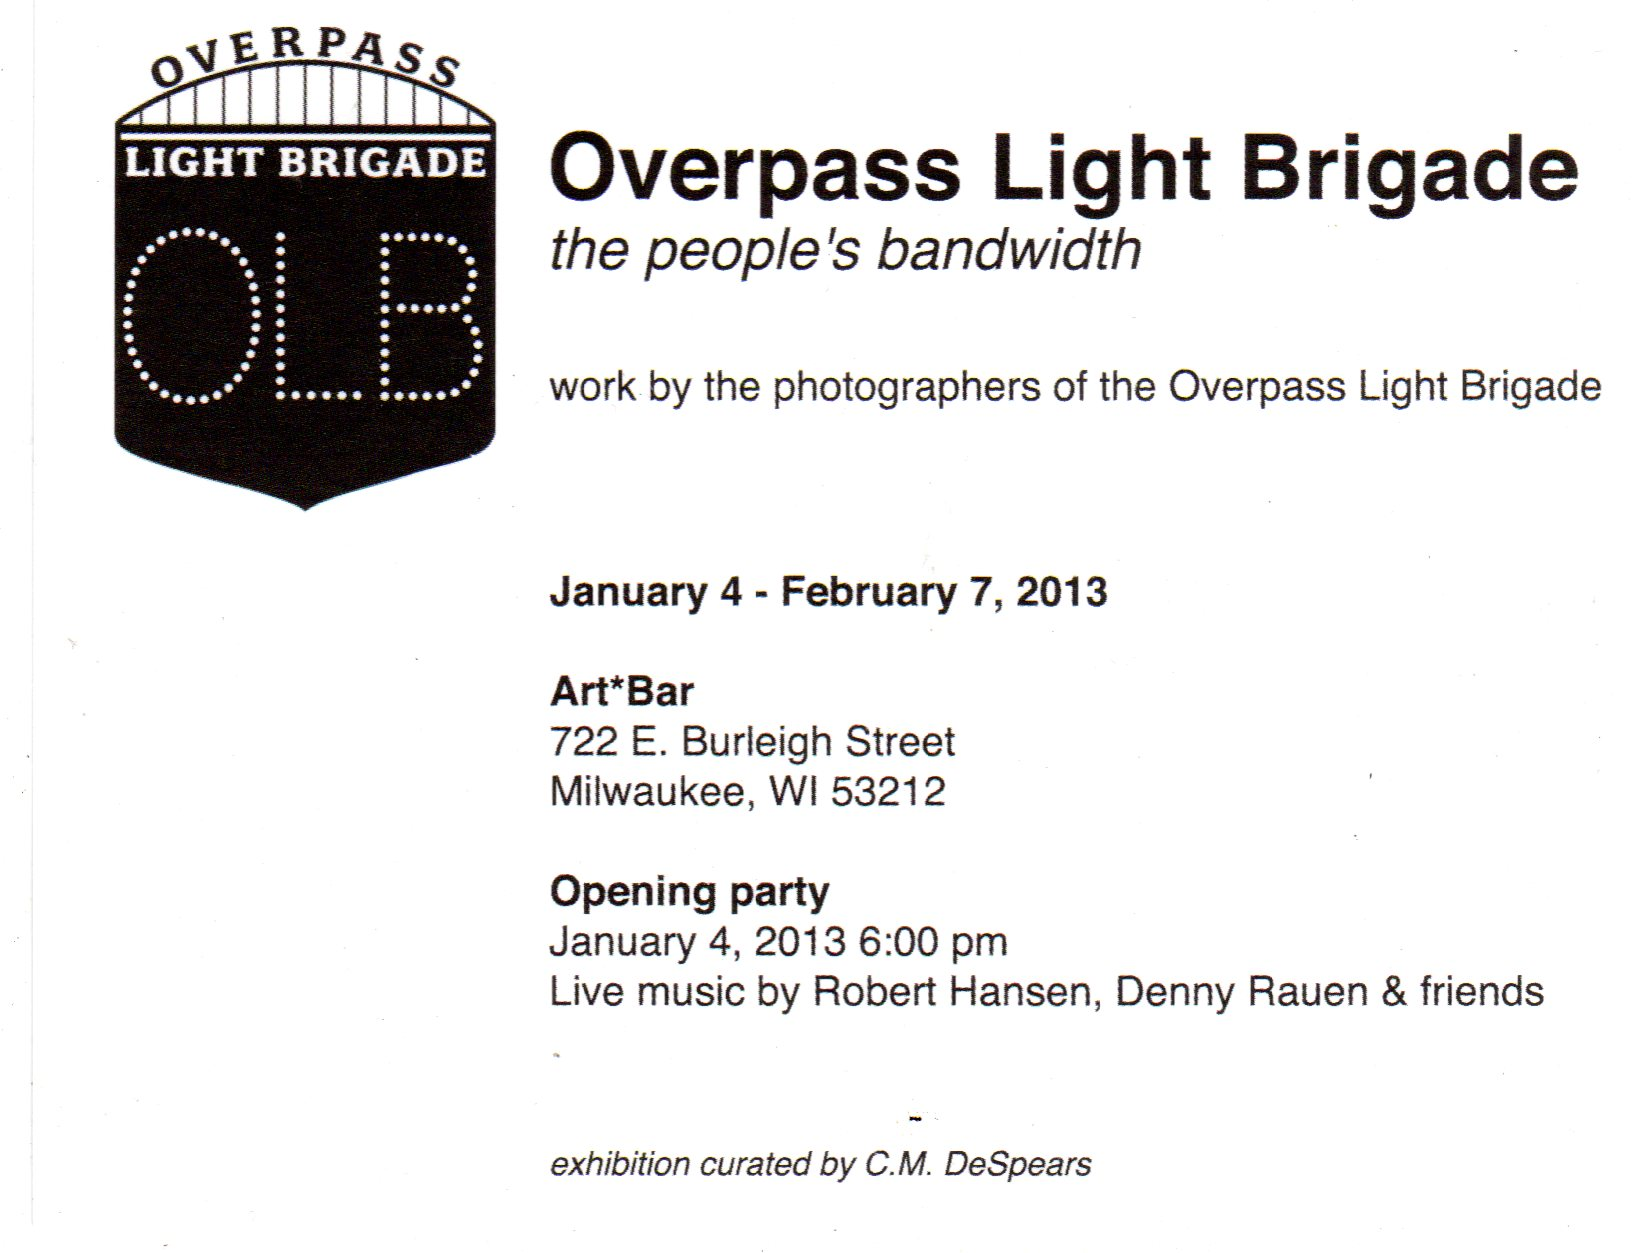 Overpass Light Brigade photo exhibit kicks off January 4th in Milwaukee